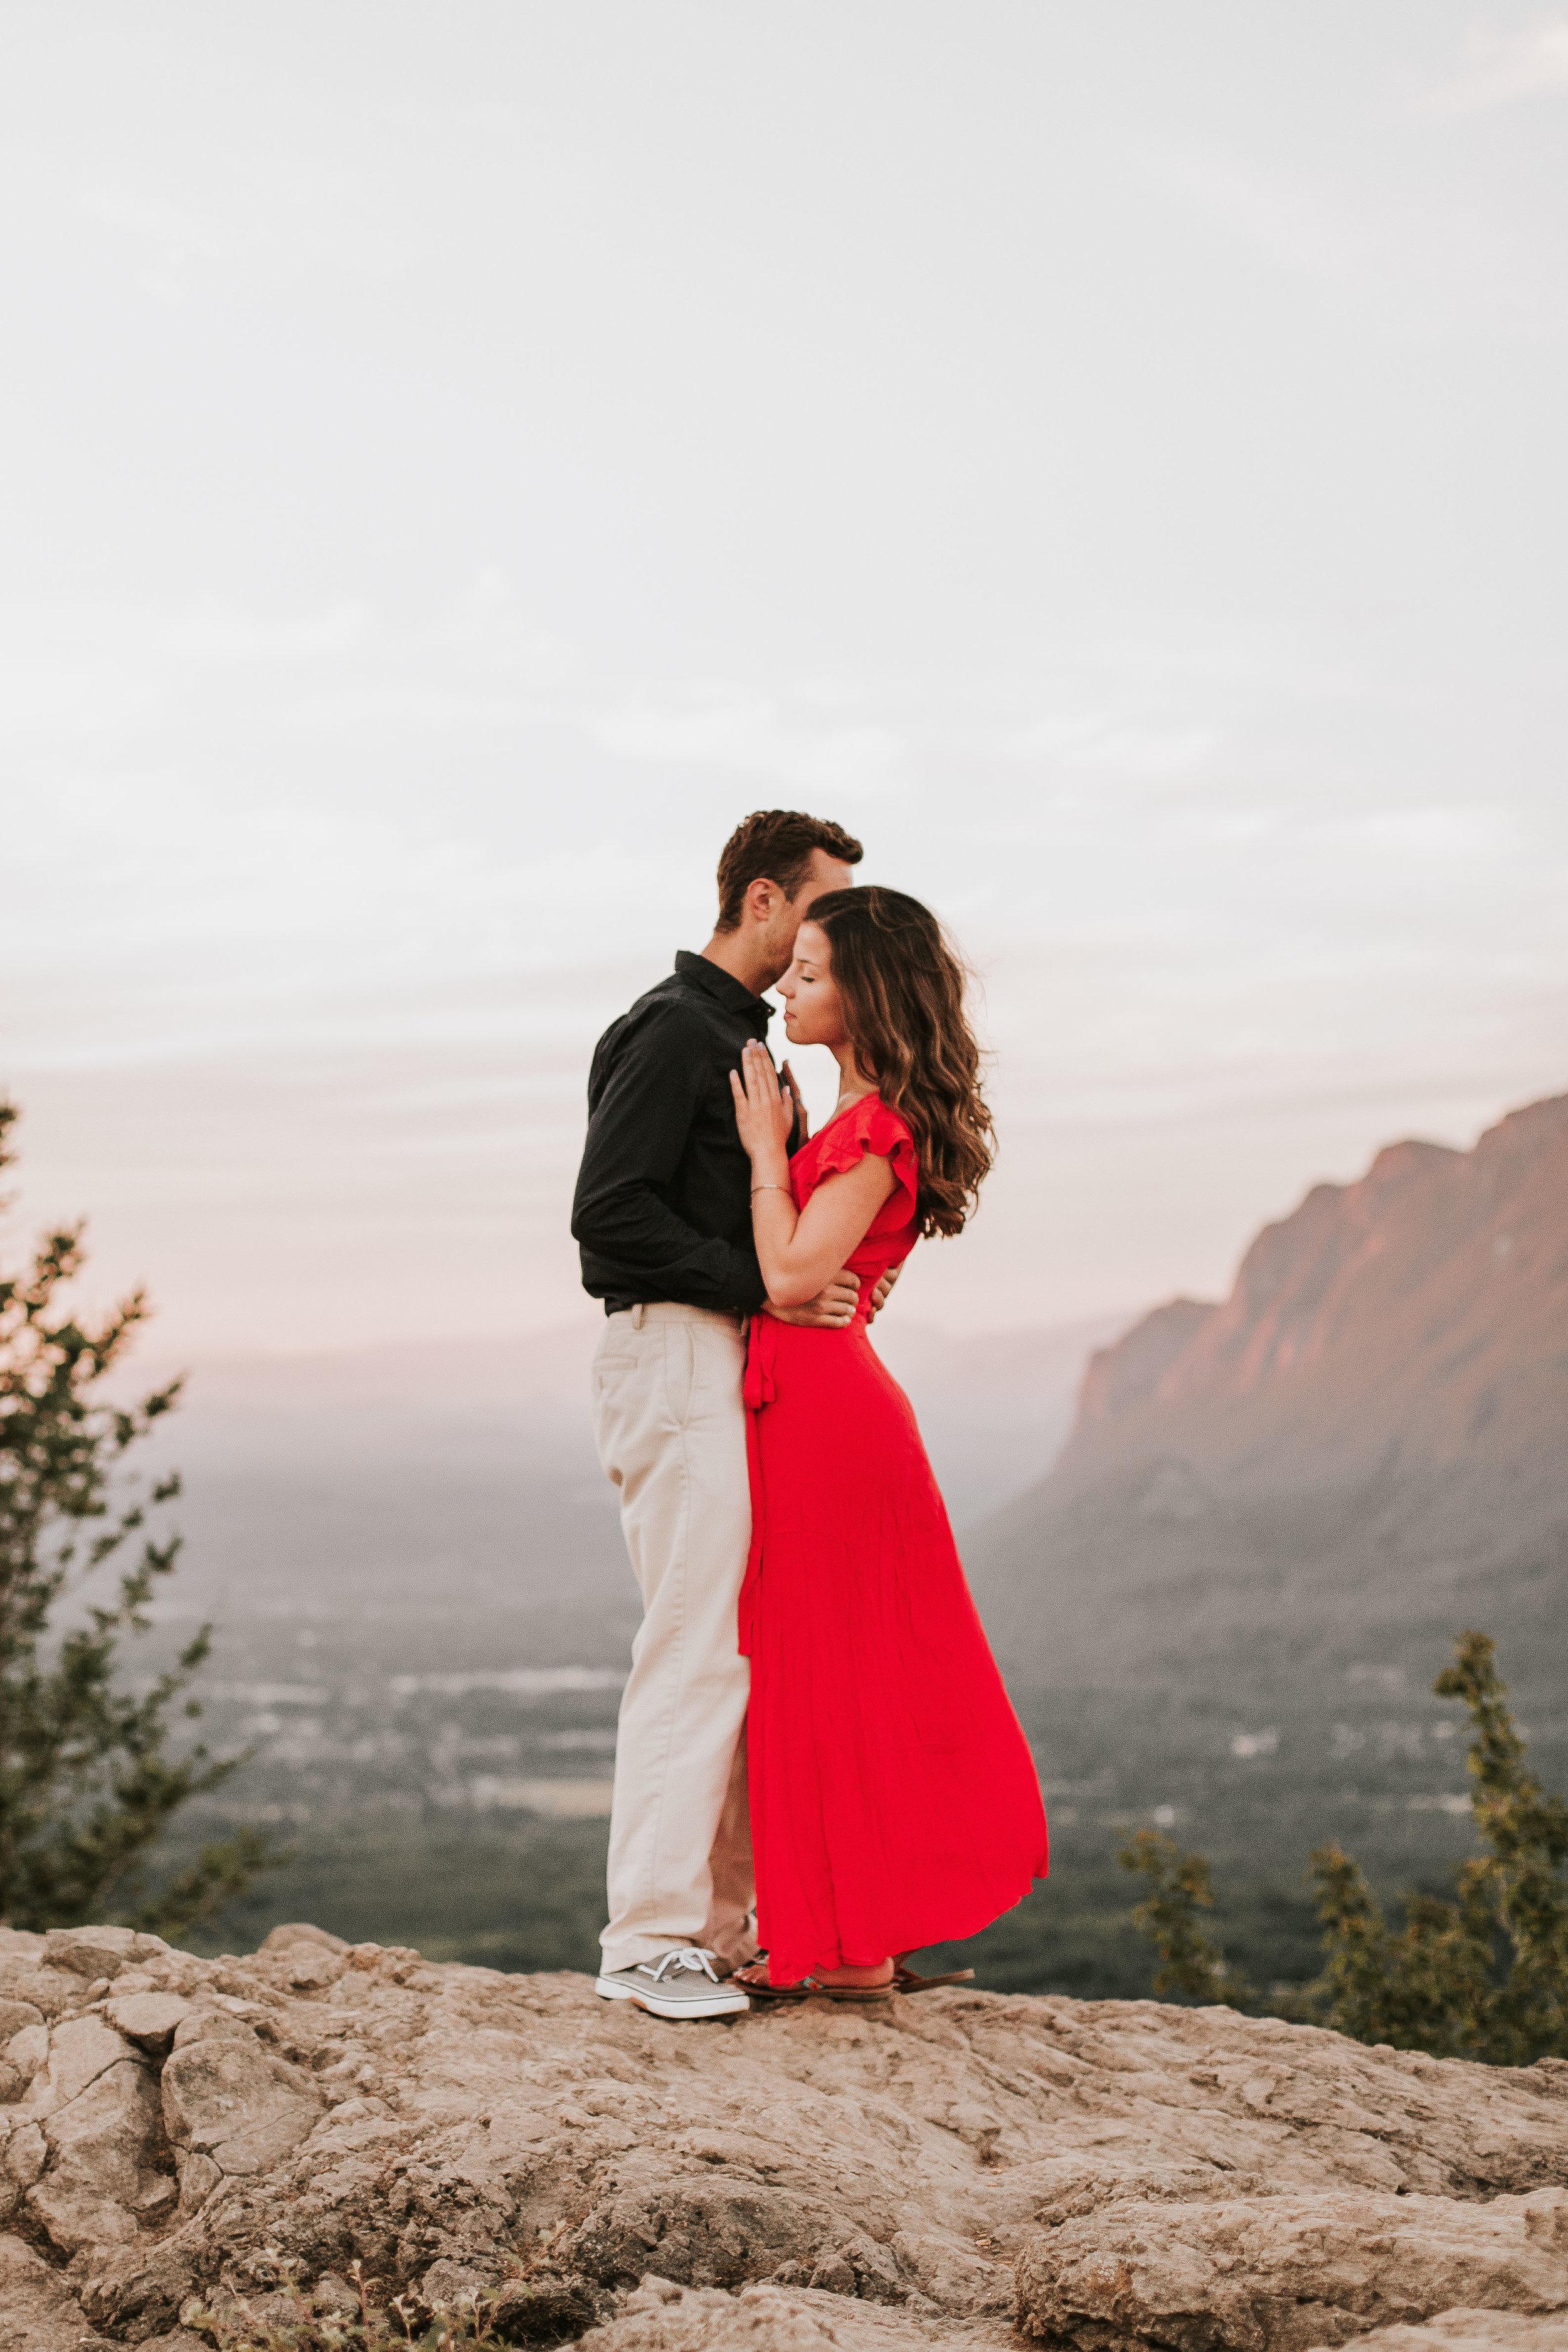 nicole-daacke-photography-rattlesnake-ridge-adventurous-engagement-session-hiking-seattle-washington-destinatino-elopement-intimate-wedding-photographer-20.jpg